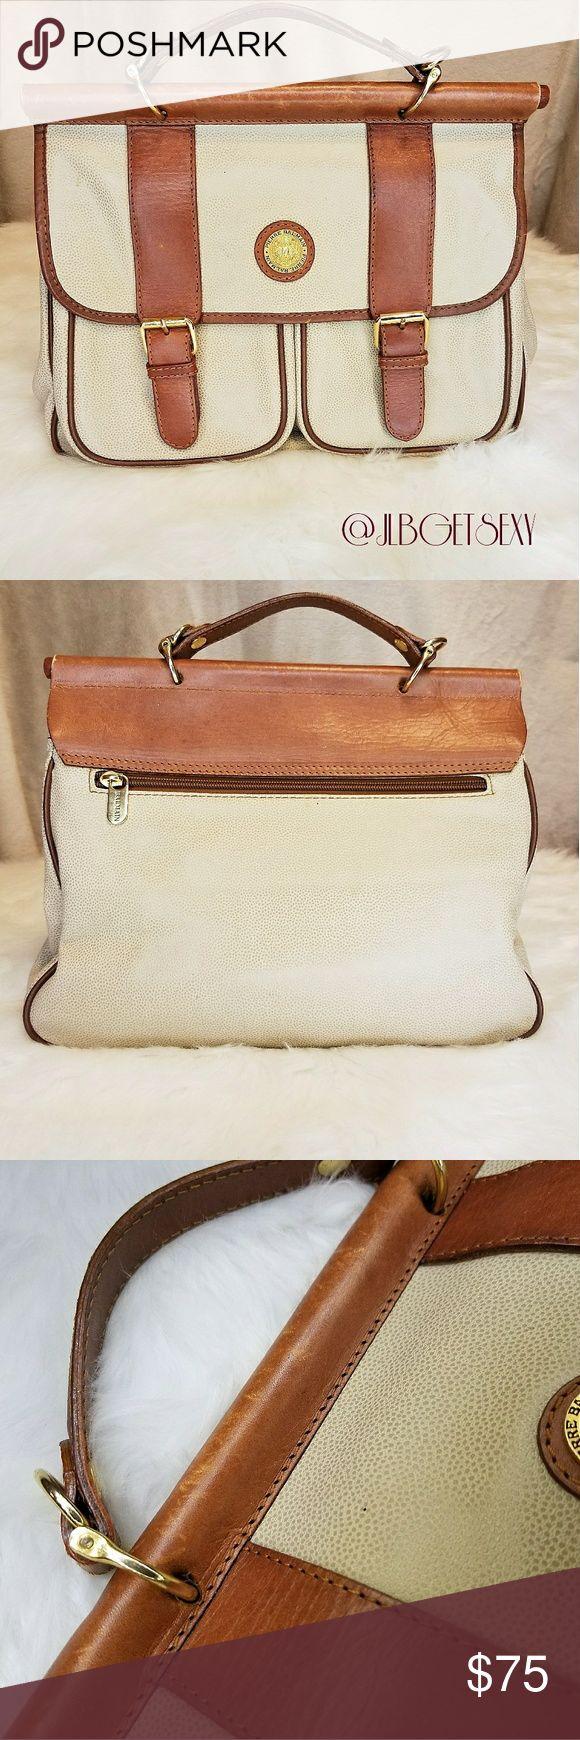 ❤STUNNING Balmain Vintage Handbag! Beautiful vintage Balmain bag! Great price this holiday season. GREAT VINTAGE condition! 😍 Balmain Bags